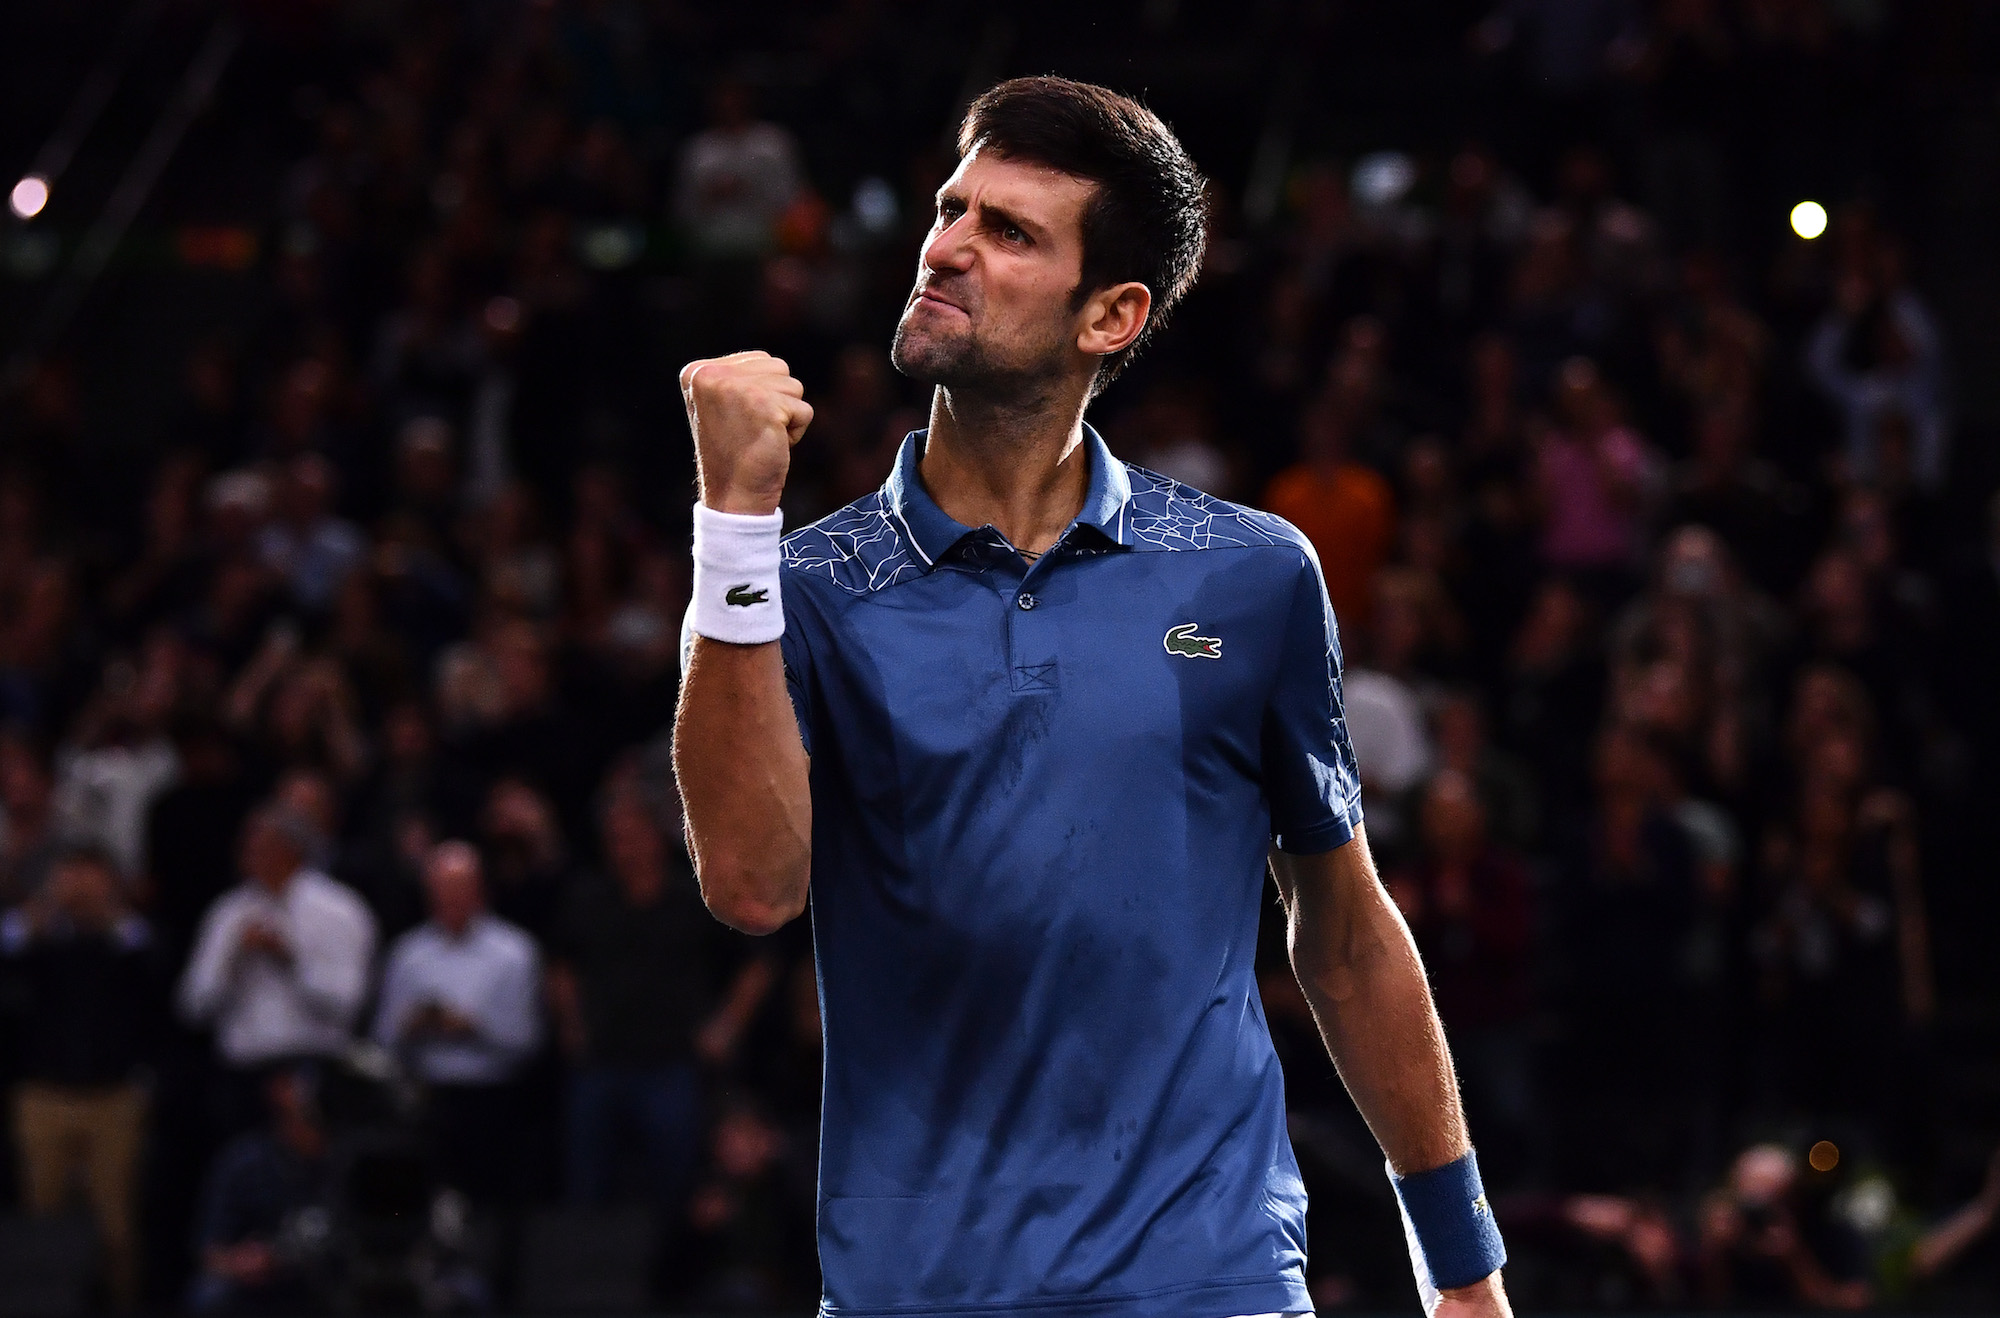 novak djokovic wins epic battle vs roger federer at paris masters 2018